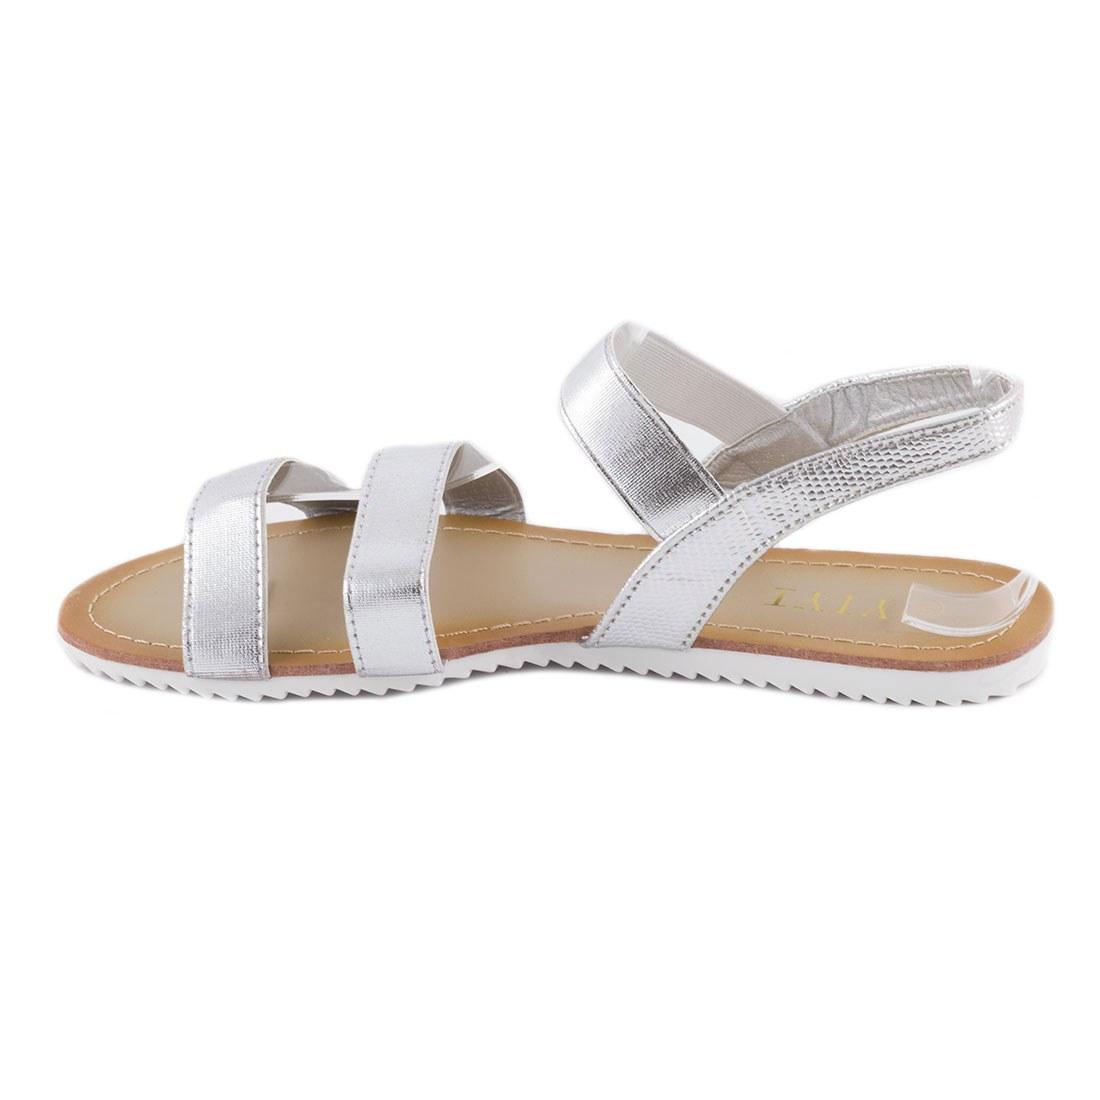 Sandale dama cu talpa joasa TP-02-NEGRU la 29,99Lei - Zibra.ro